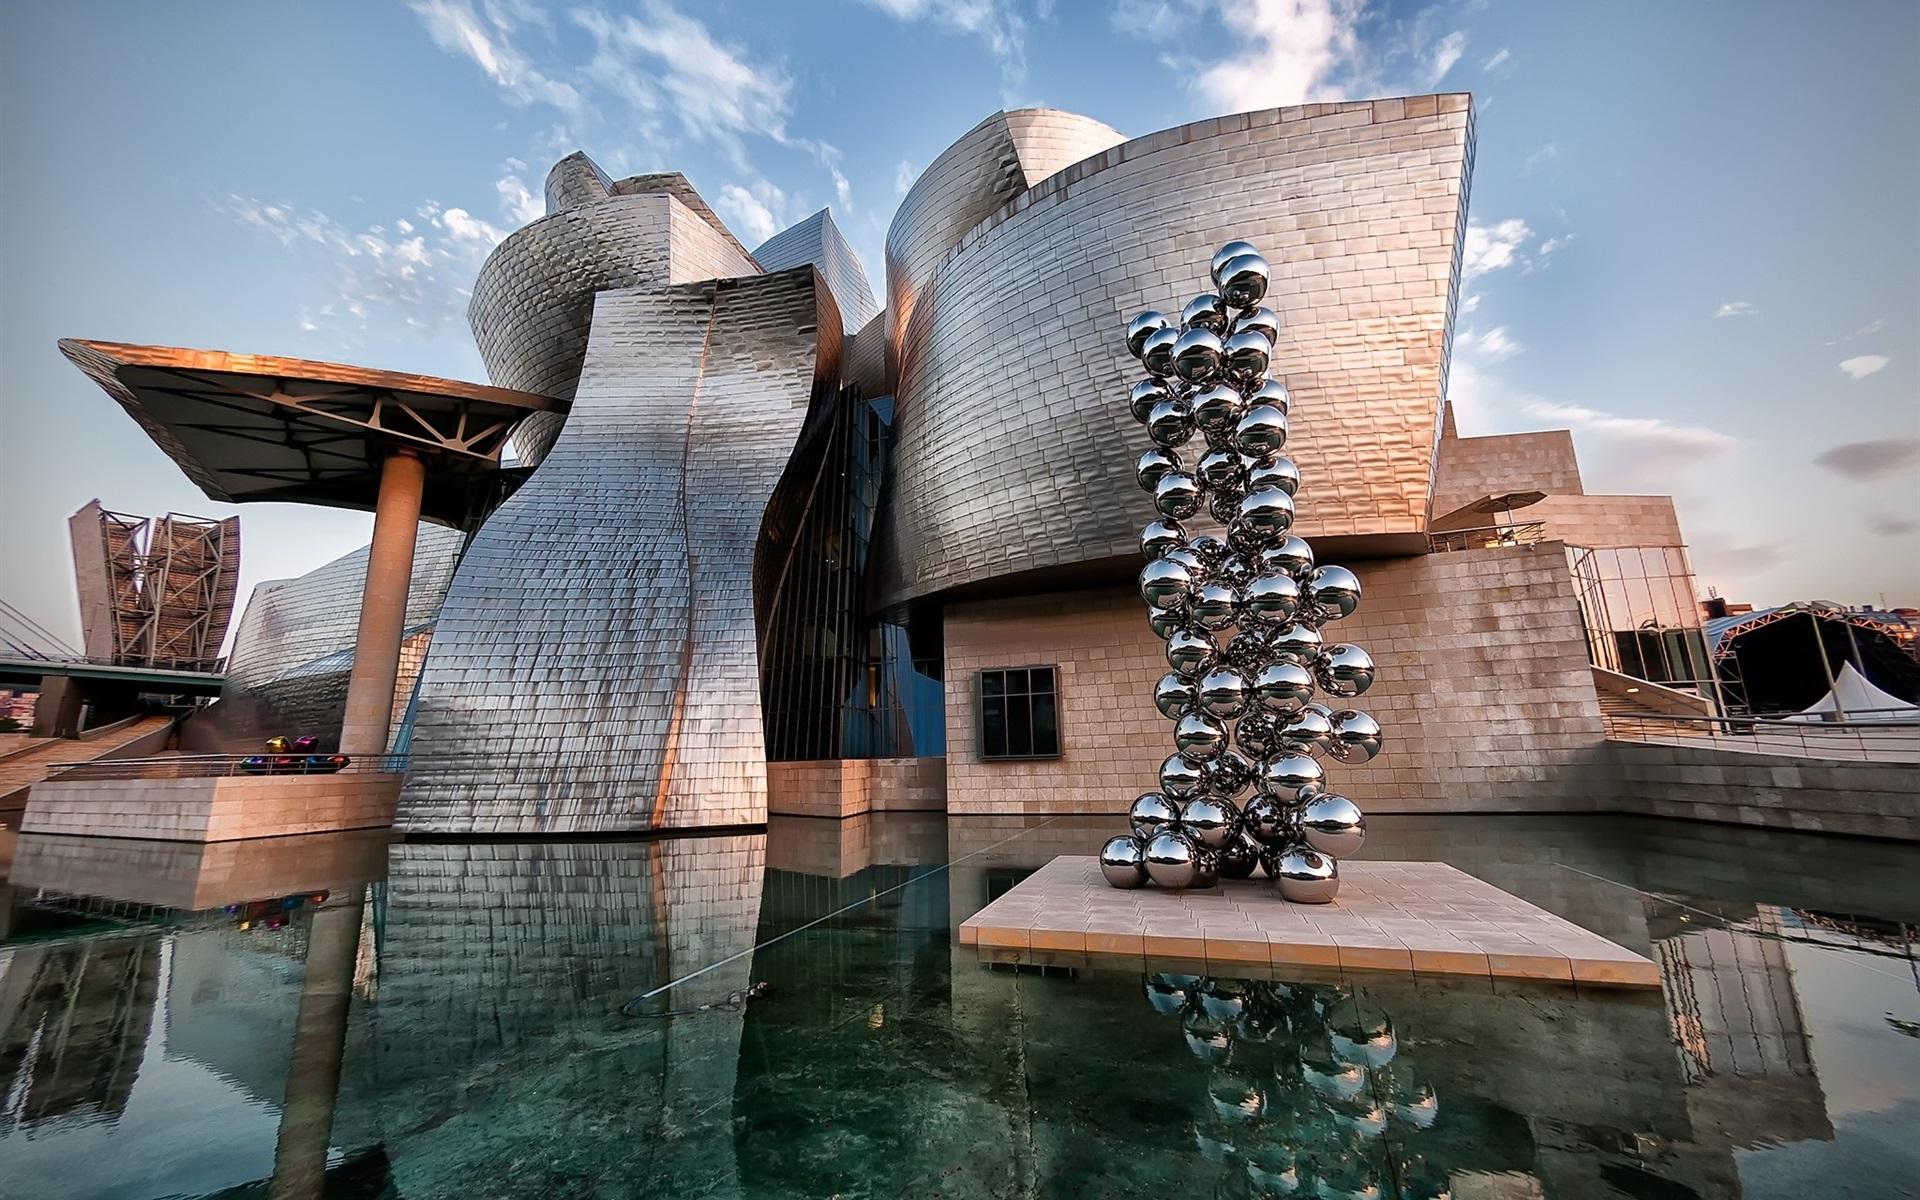 Guggenheim Museo.Wallpaper Spain Museo Guggenheim Bilbao 1920x1200 Hd Picture Image